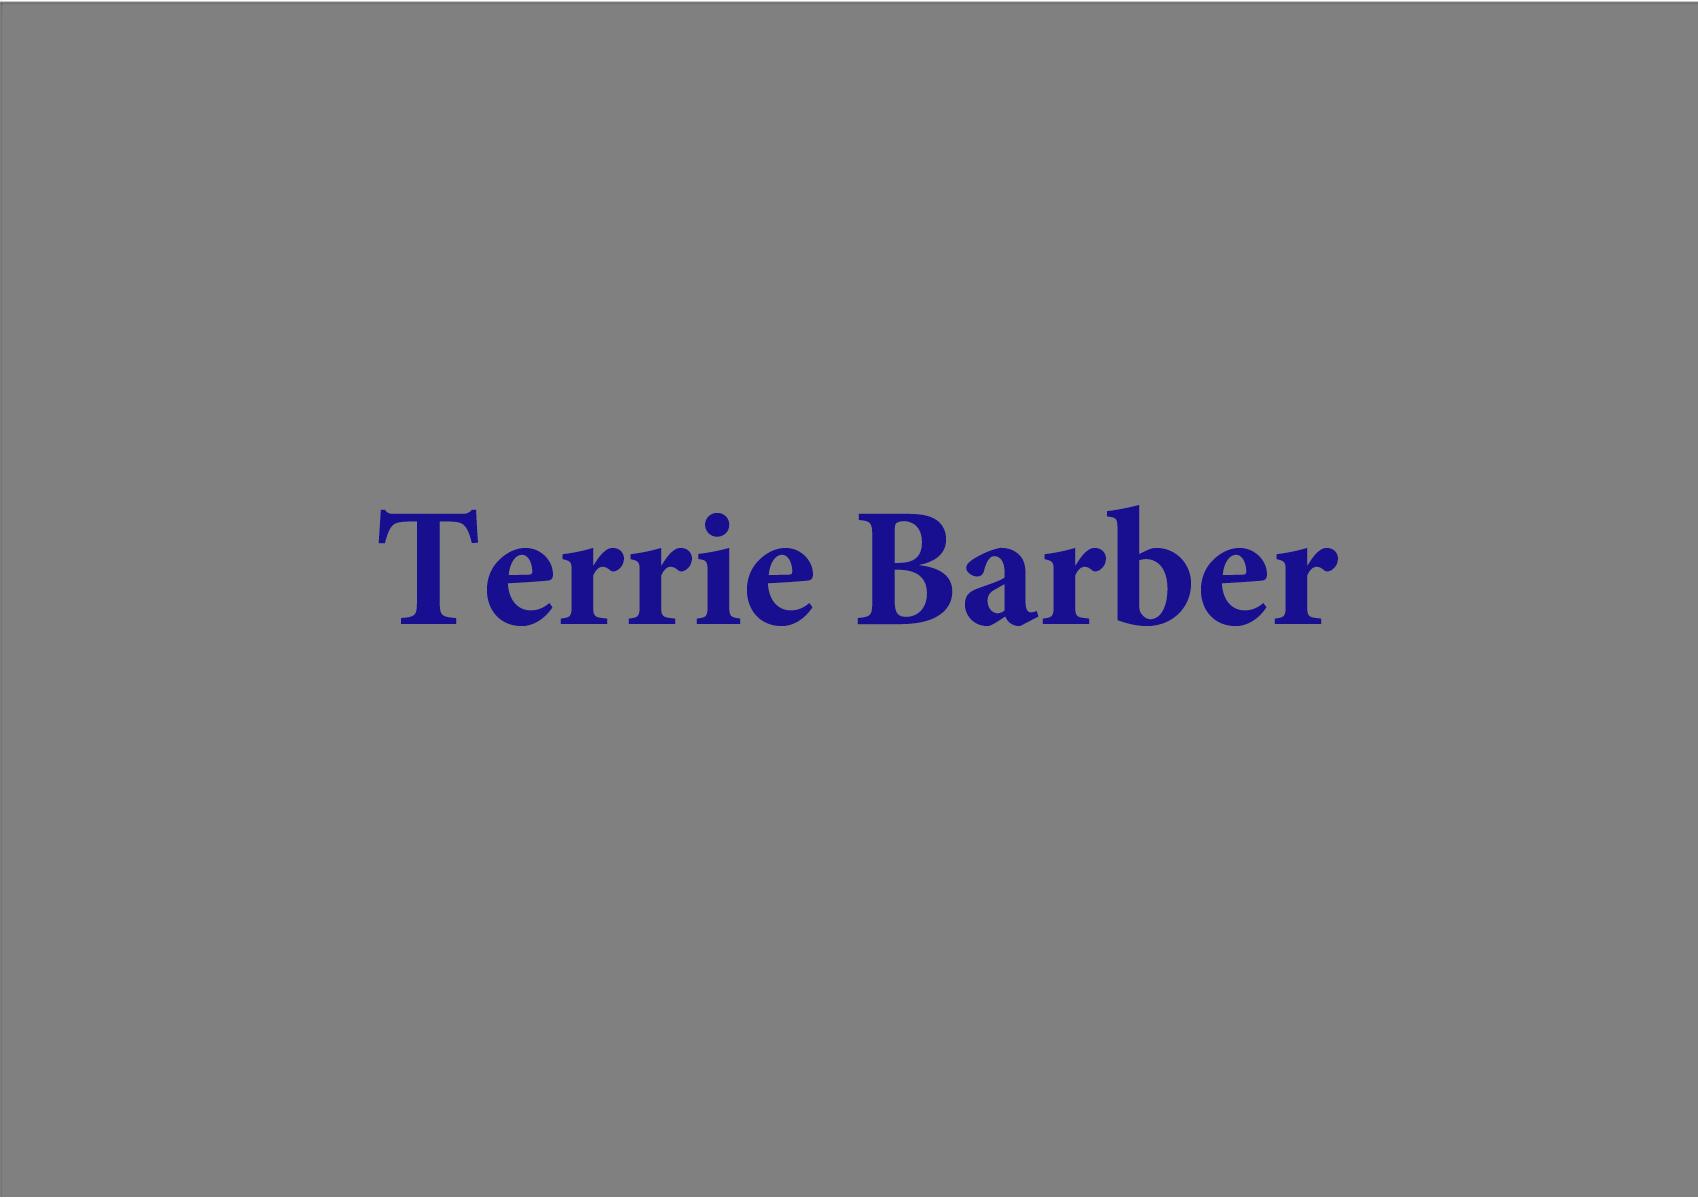 terrie barber.png